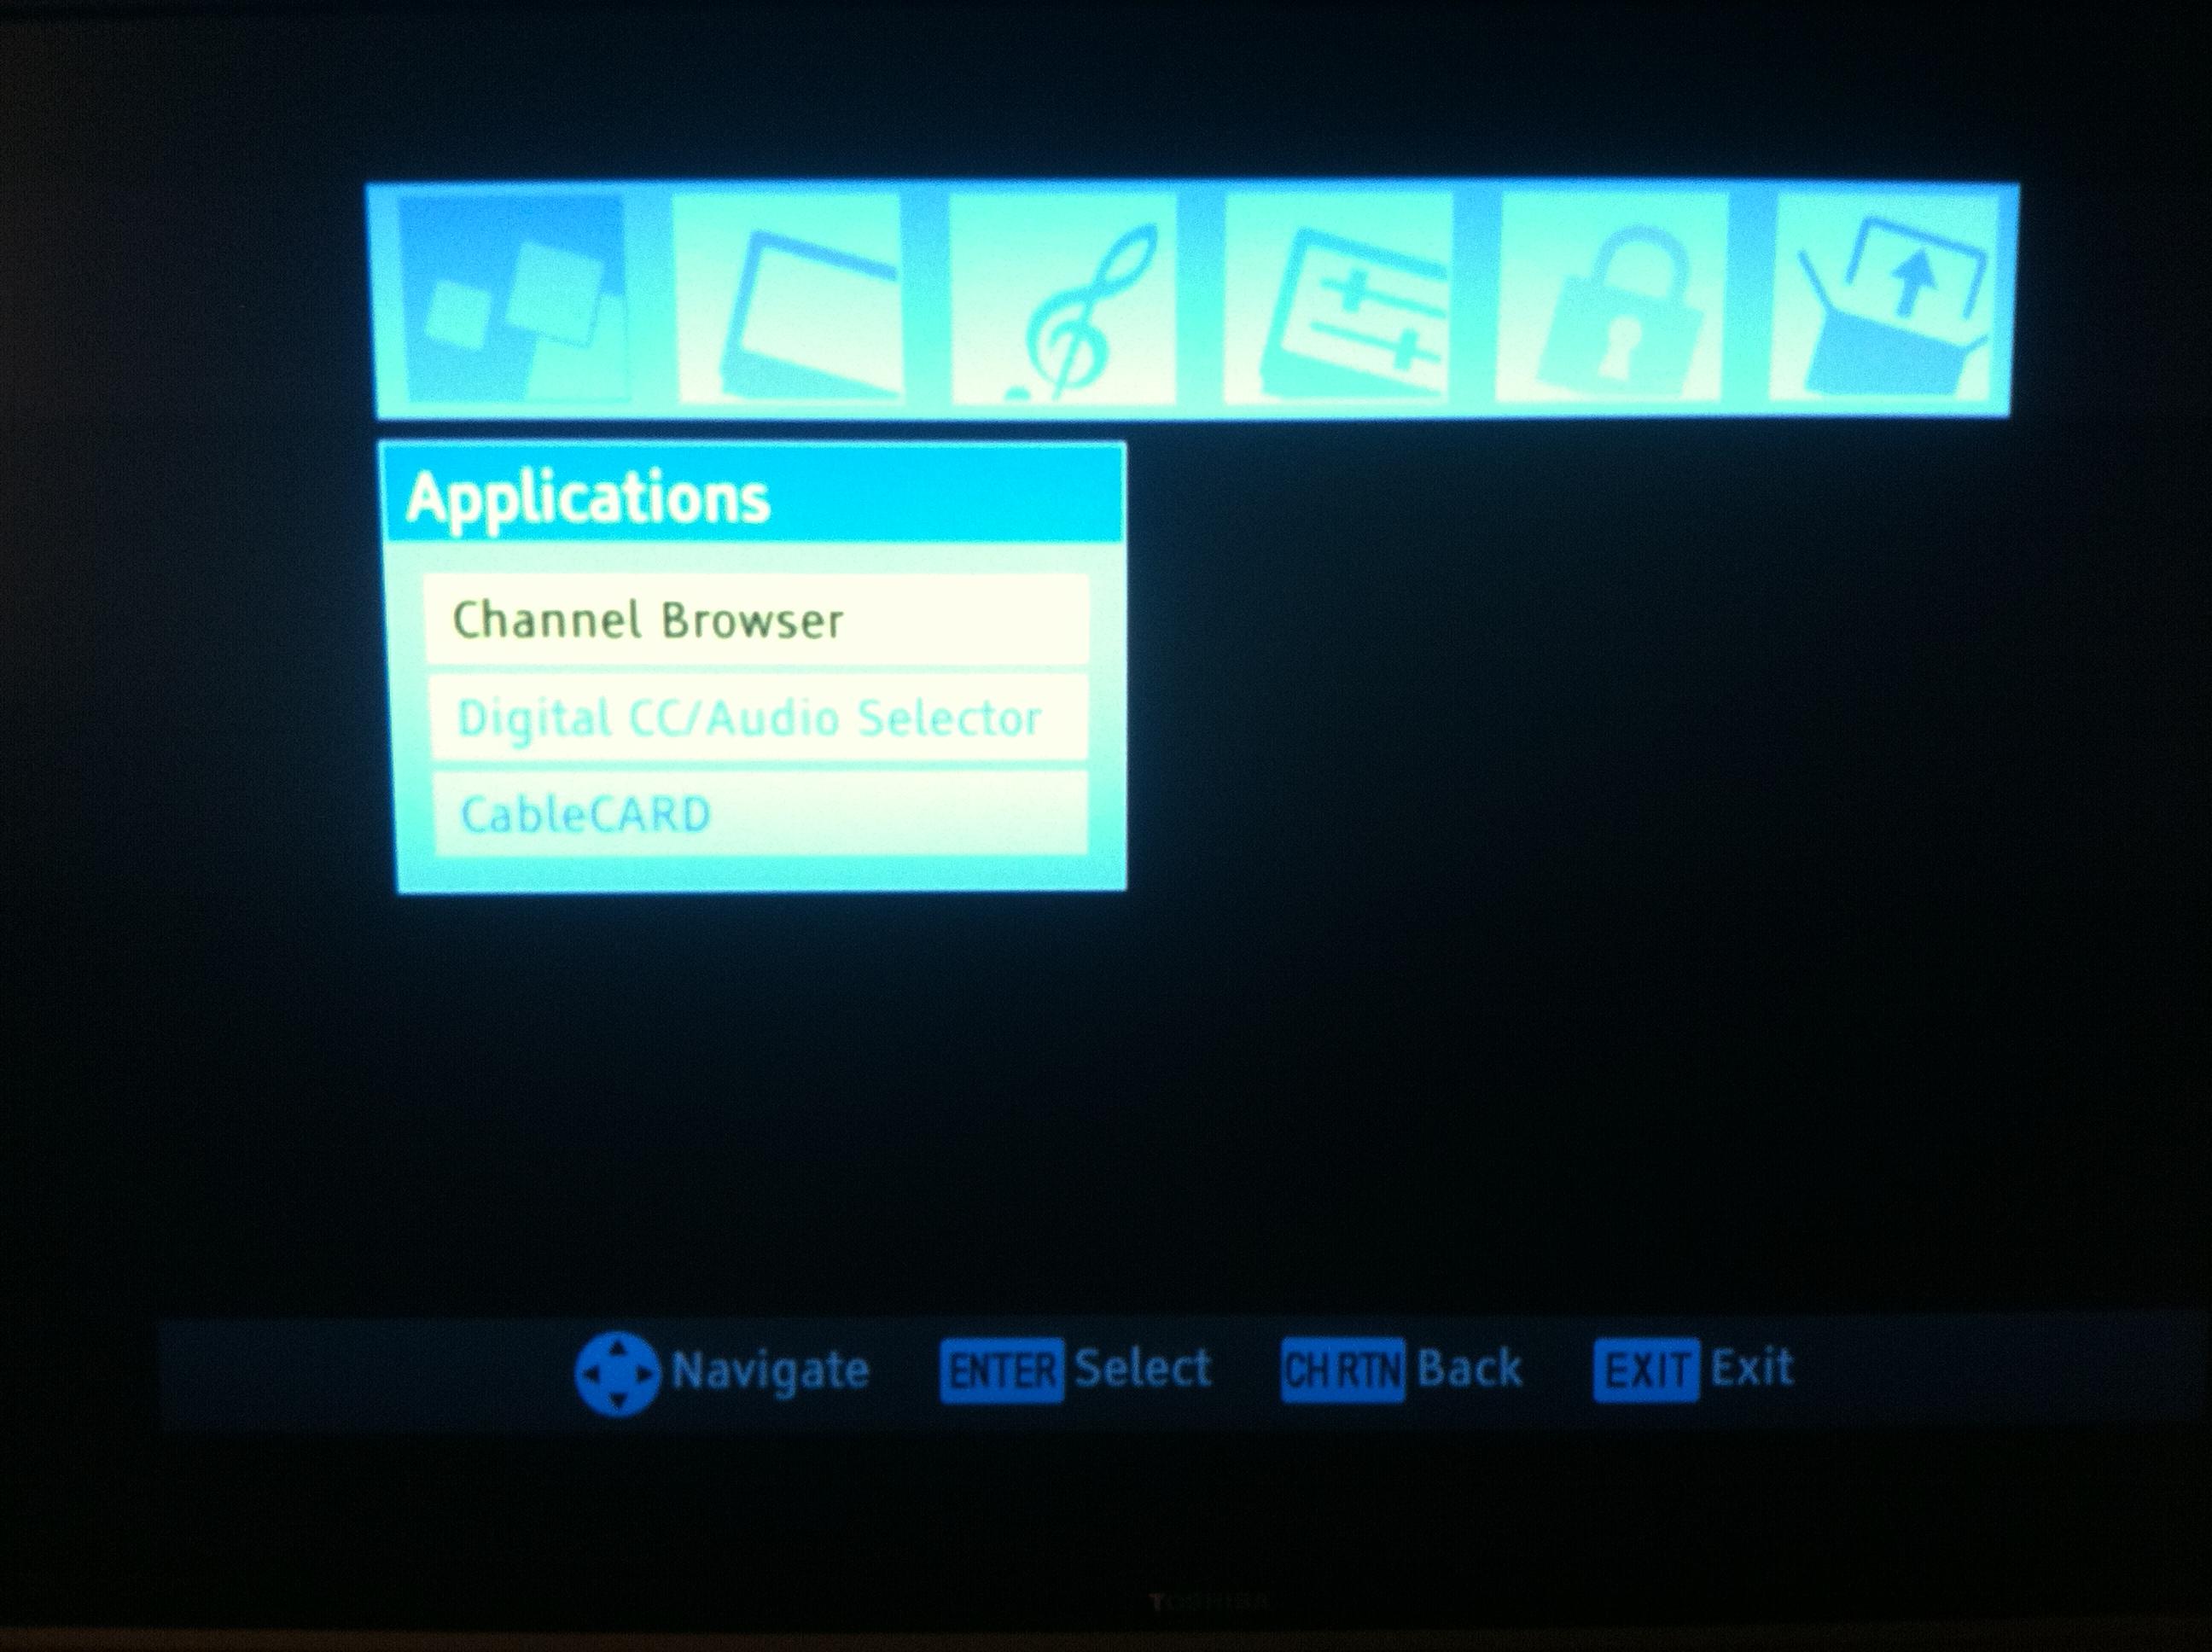 50hm66 Toshiba Secret Menu Dlp 52hm95 Wiring Diagram I Have A My Screen Turned Very Bright